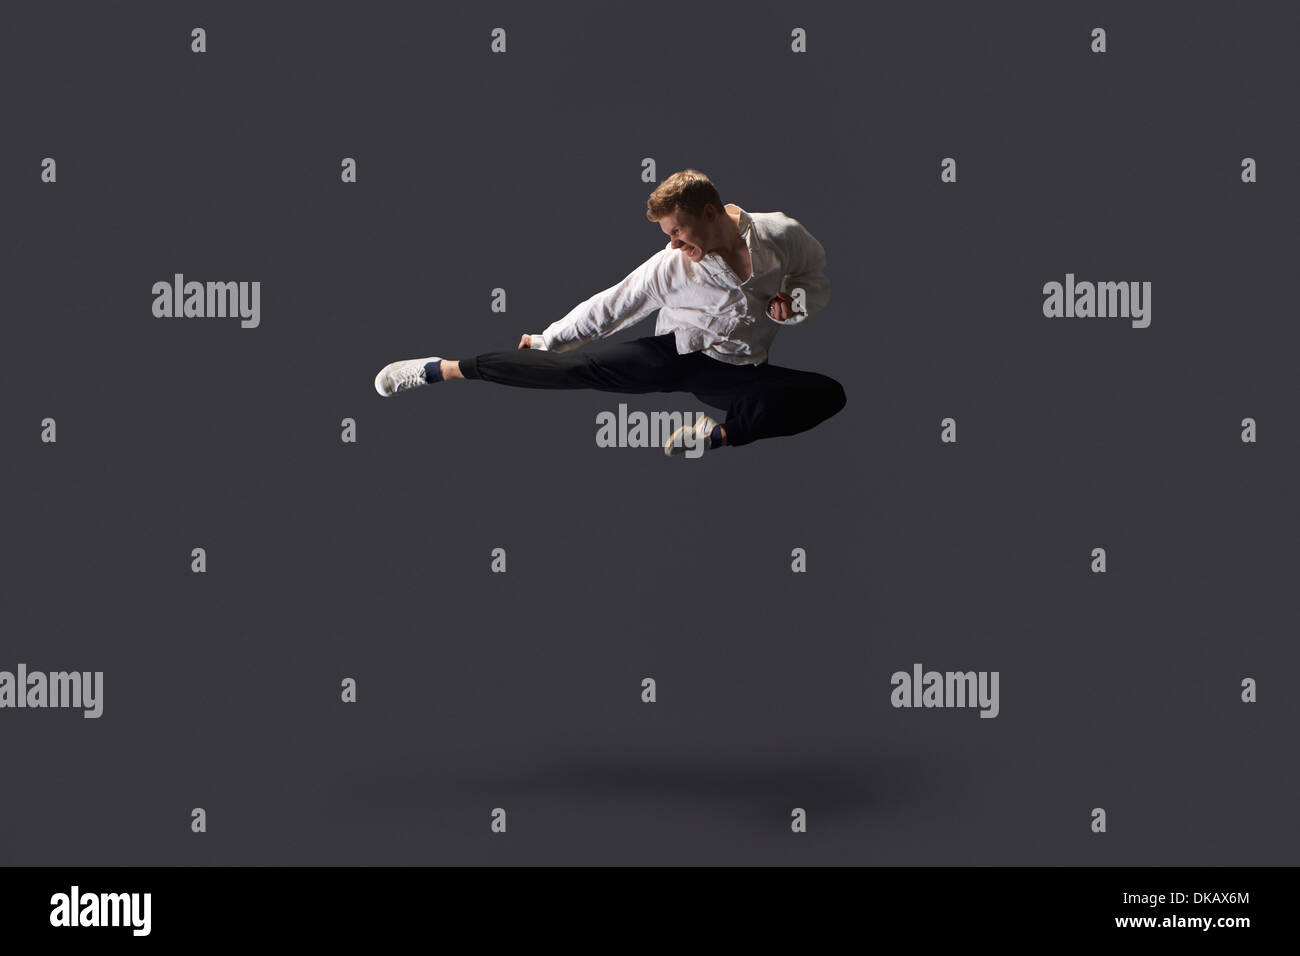 Studio shot of young man mid air practicing martial arts - Stock Image